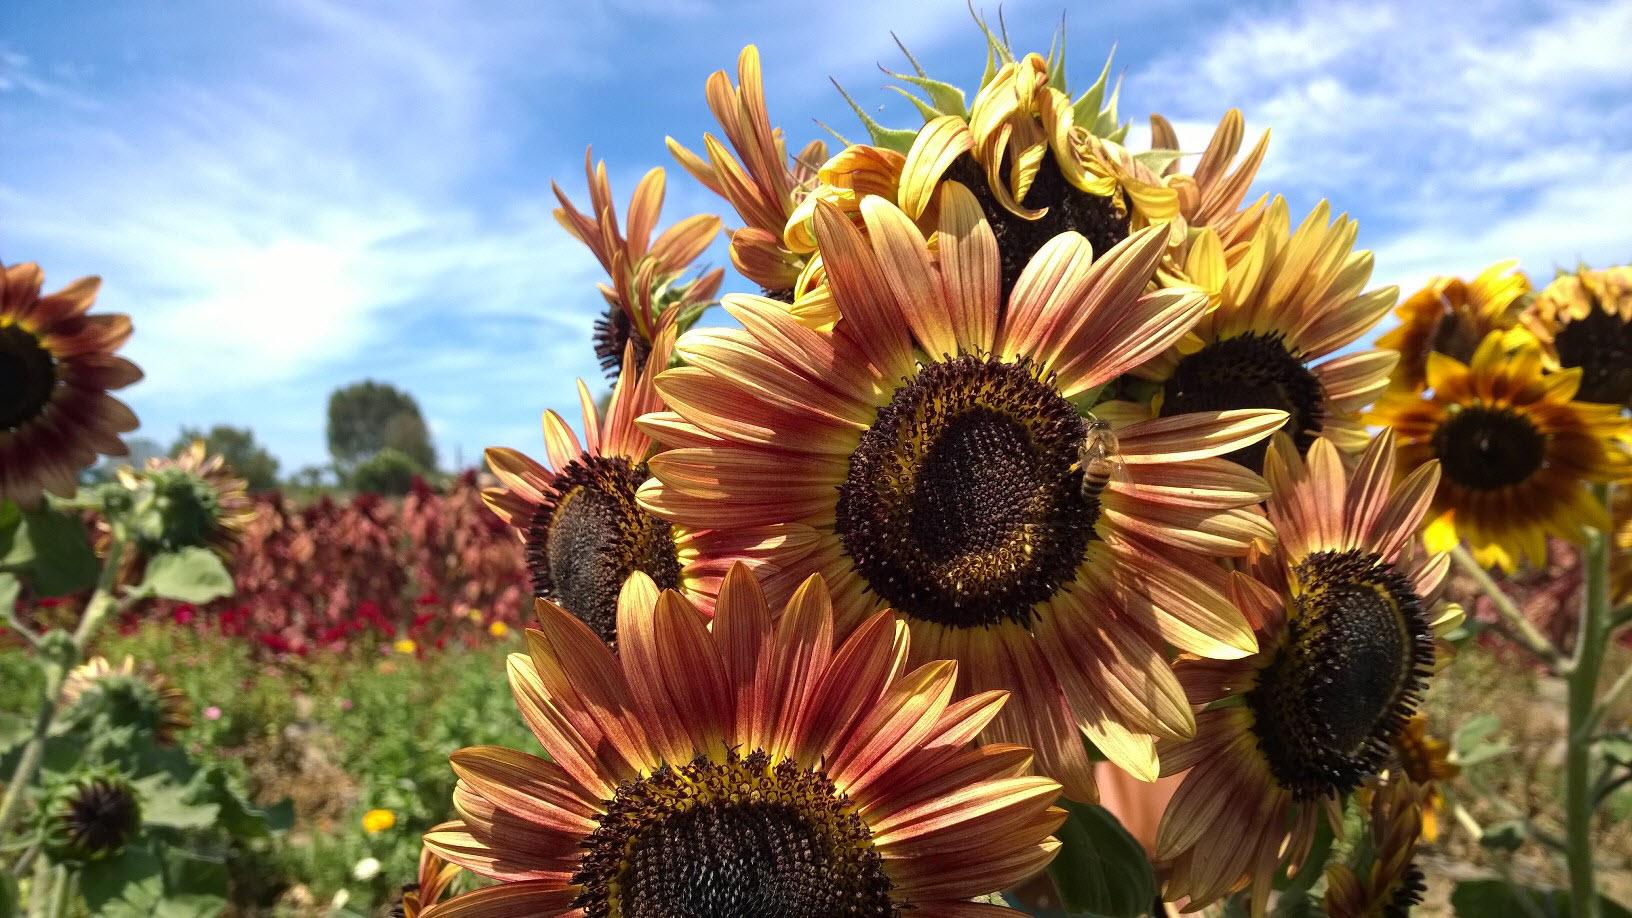 Sunflowers at Suzie's Farm